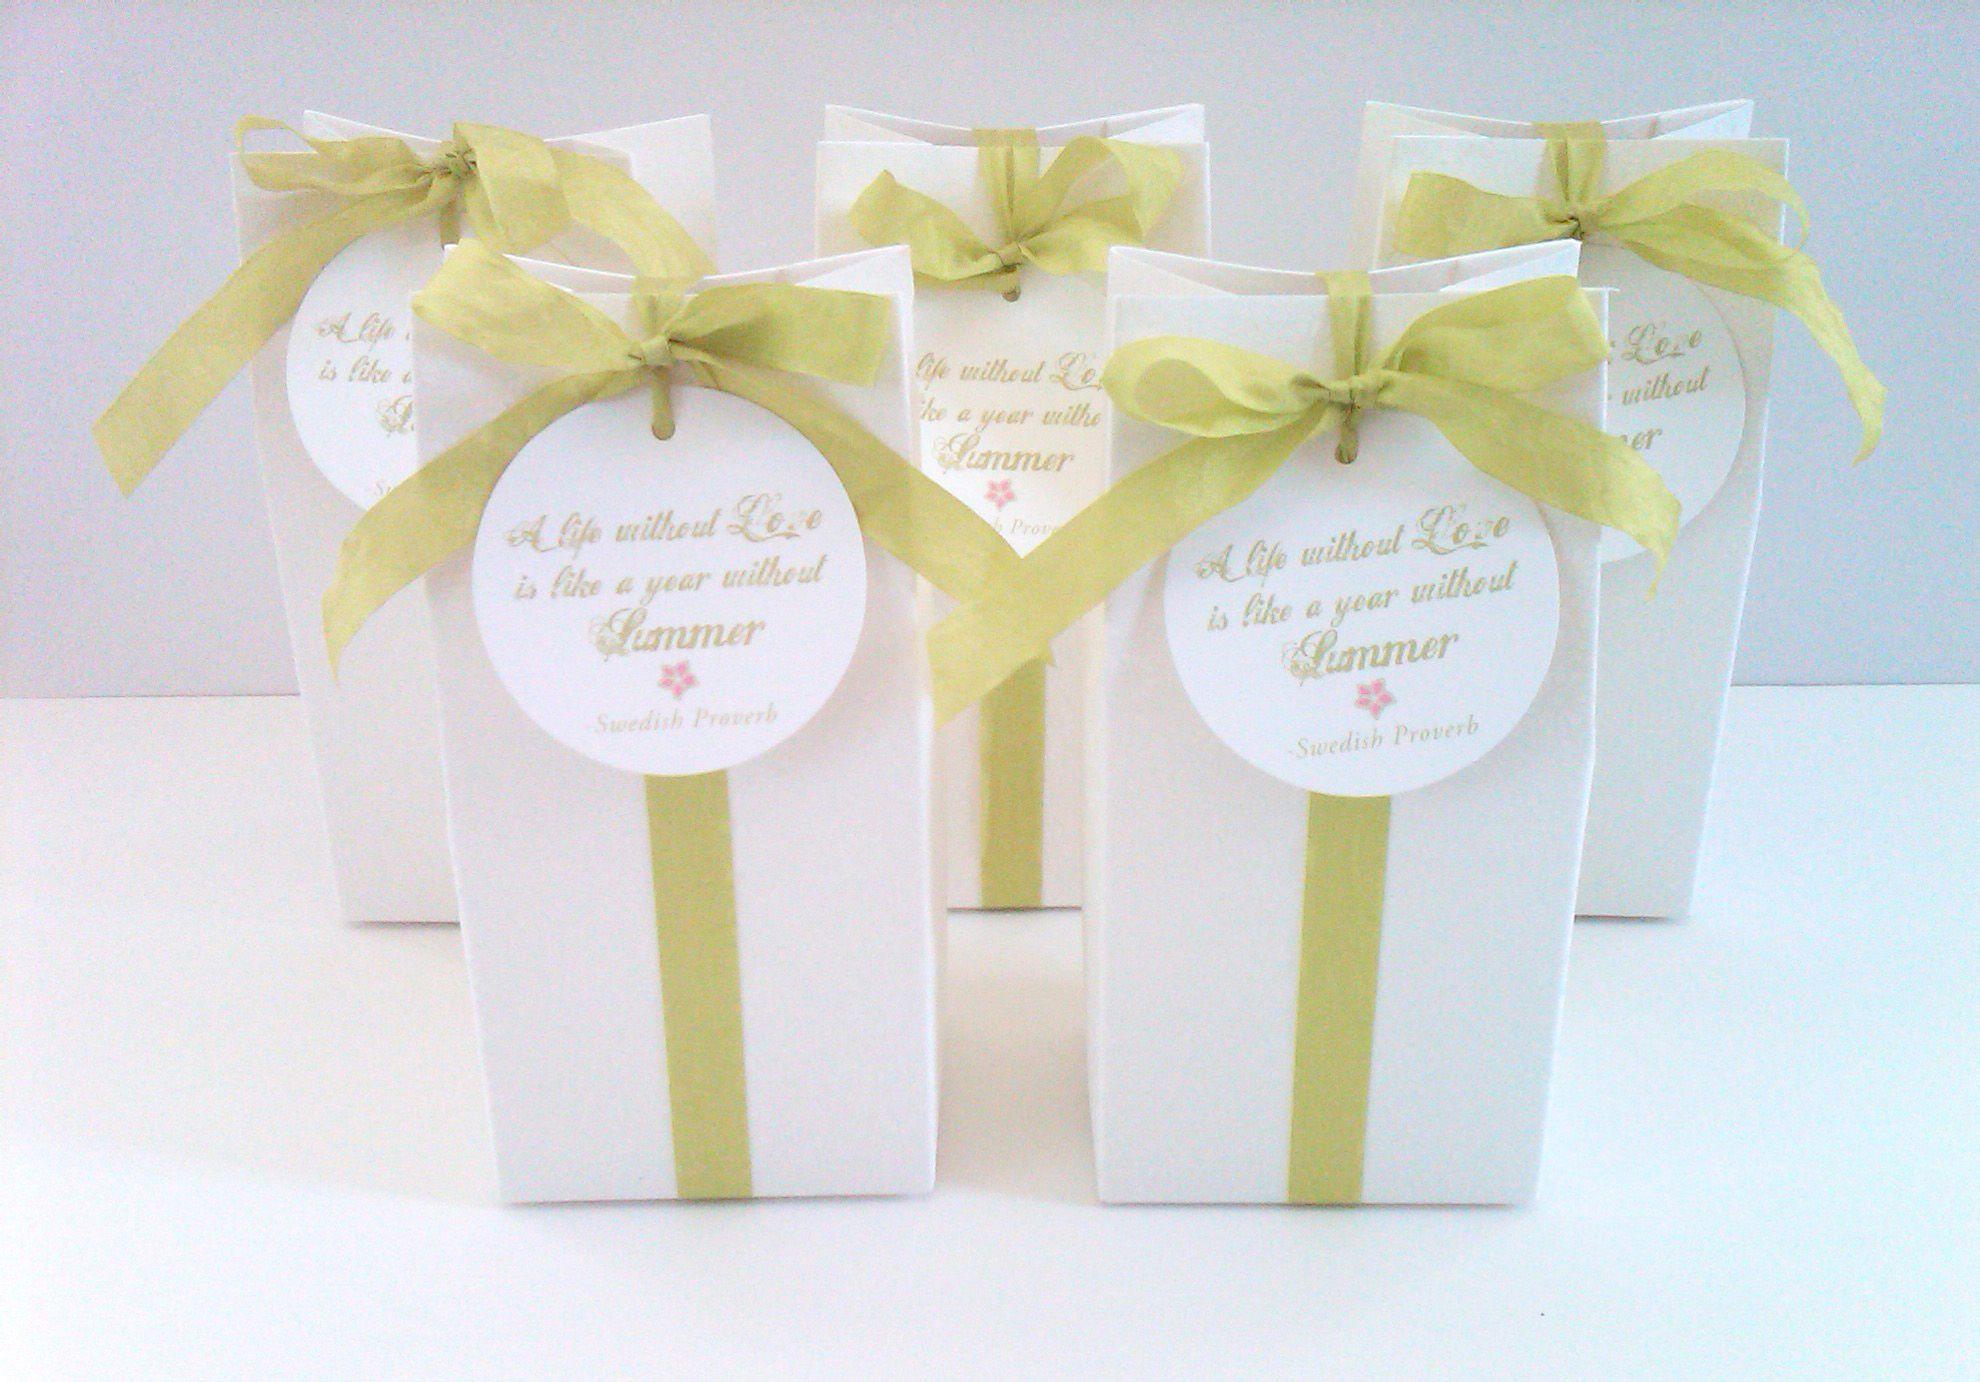 Handmade boxes for summer